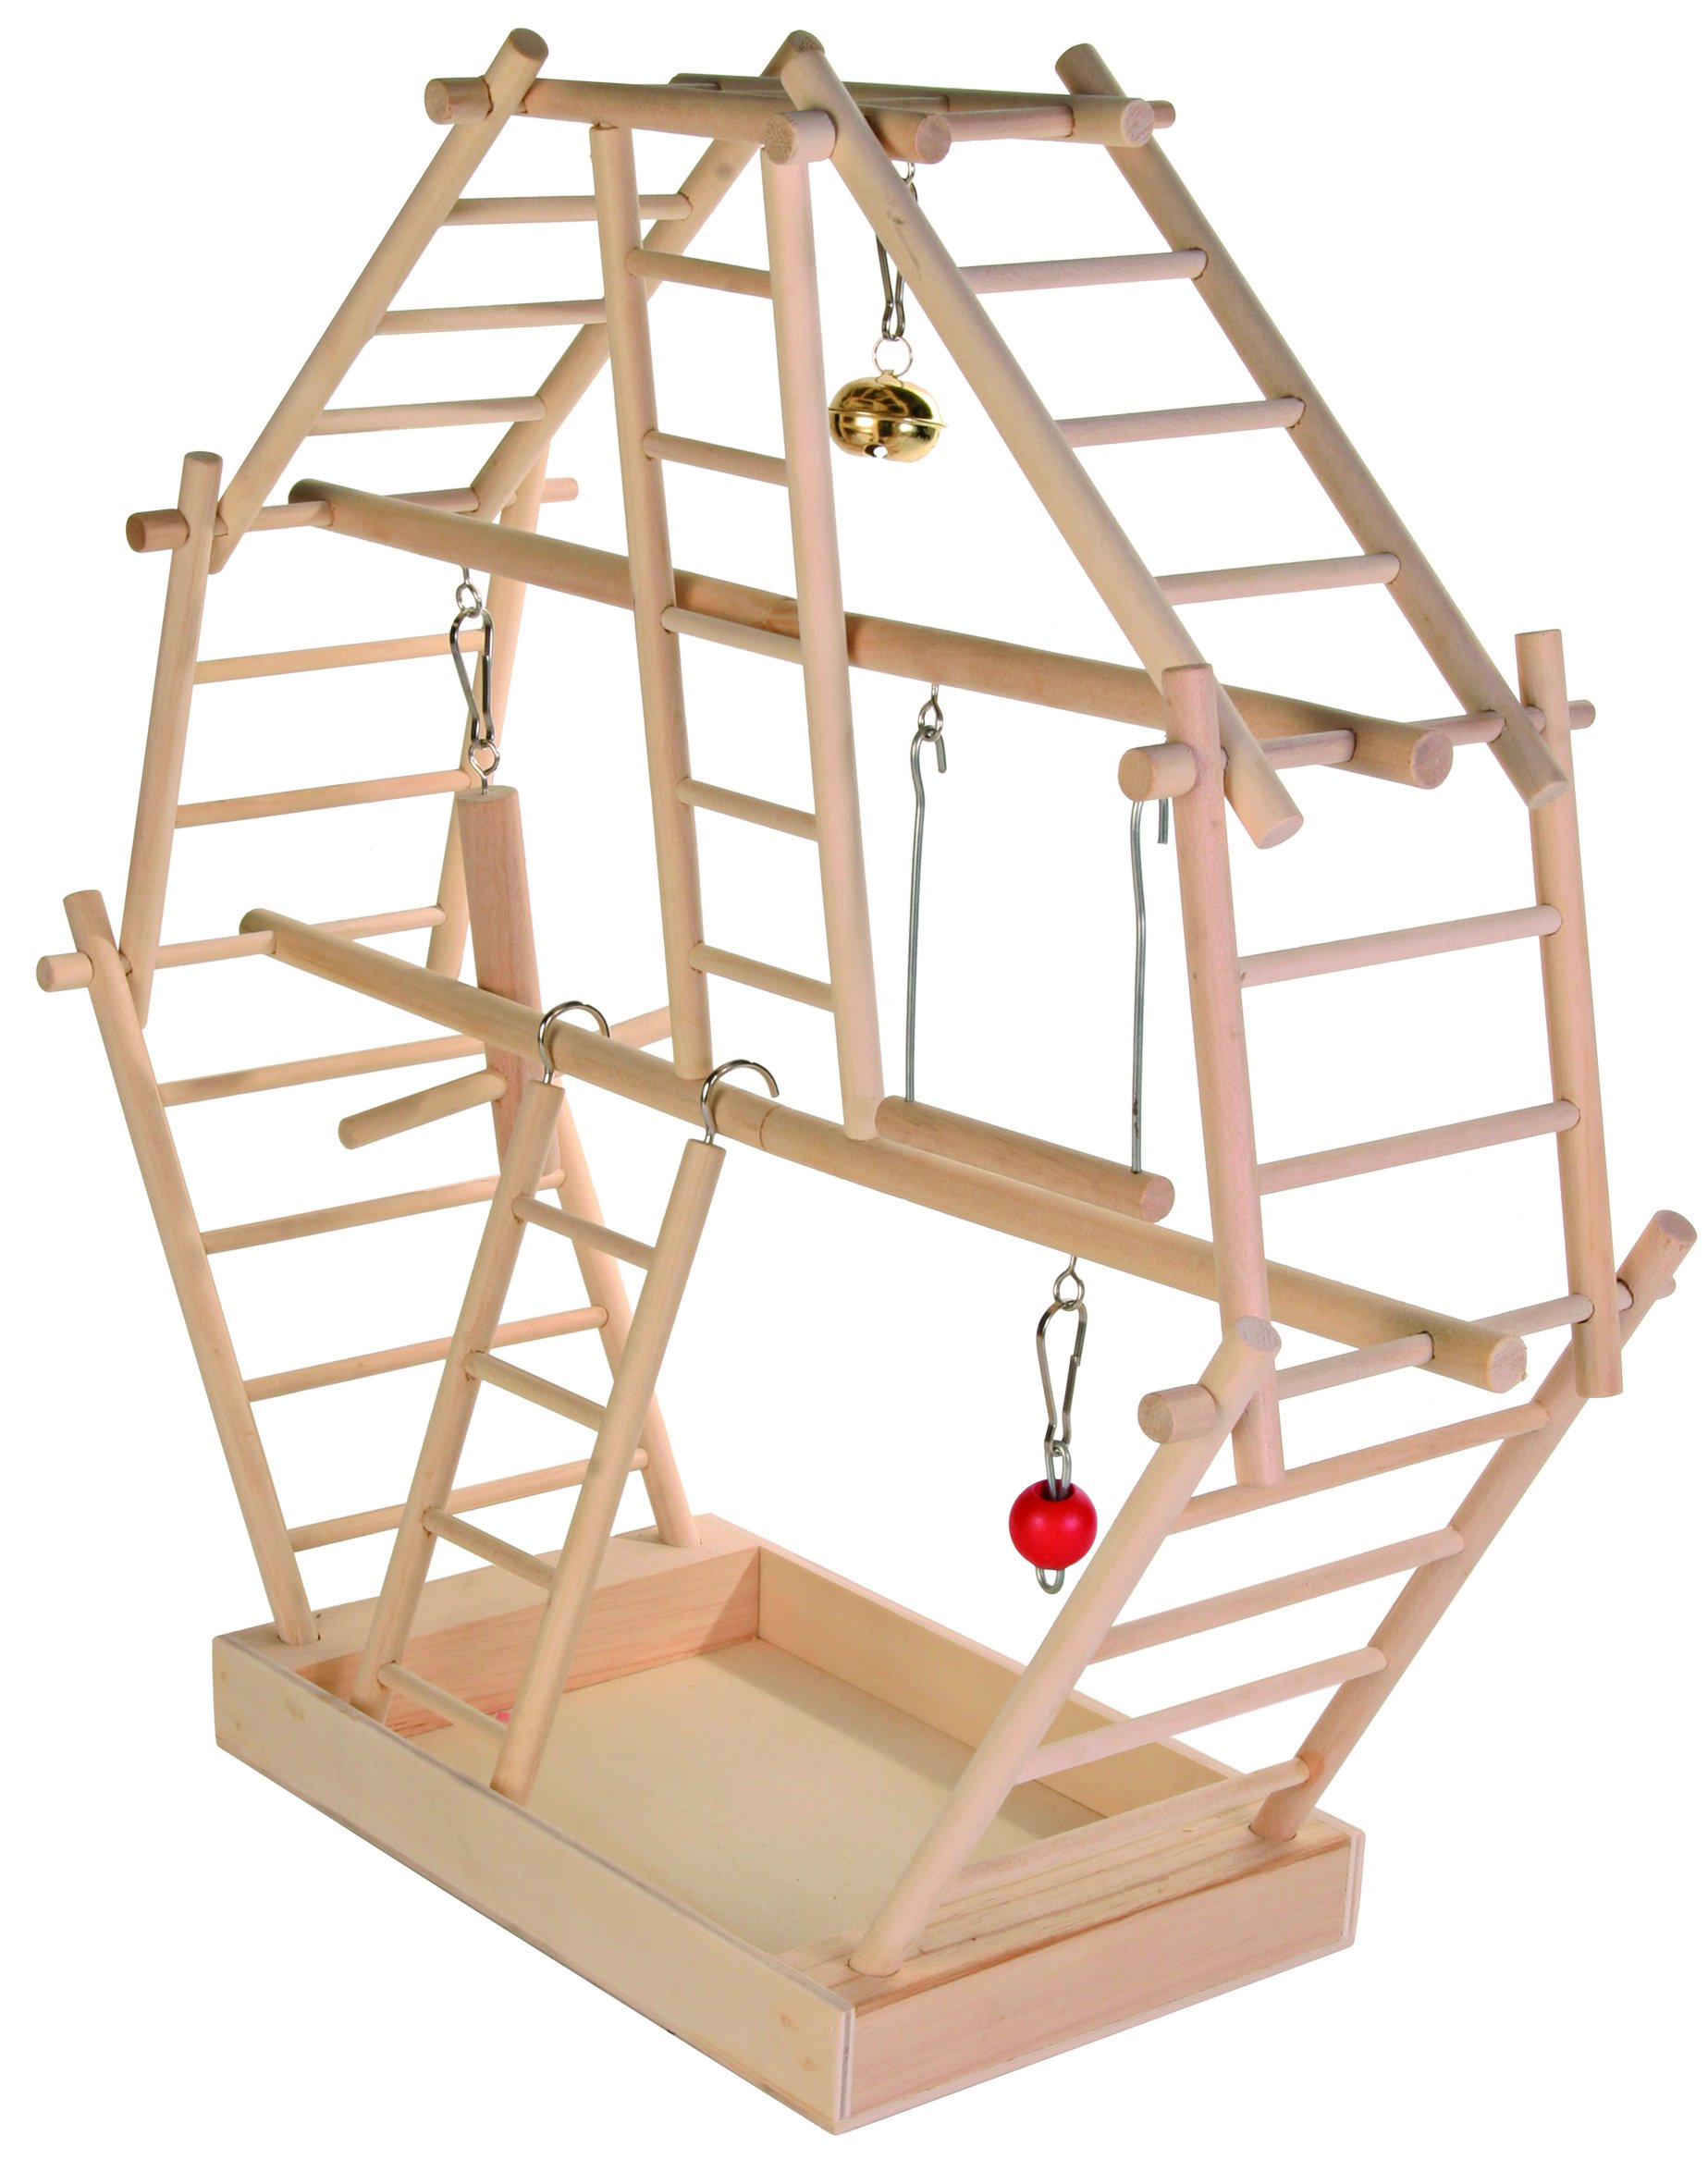 Trixie 5659 Wooden Ladder Playground 44 × 44 × 16 cm by Trixie